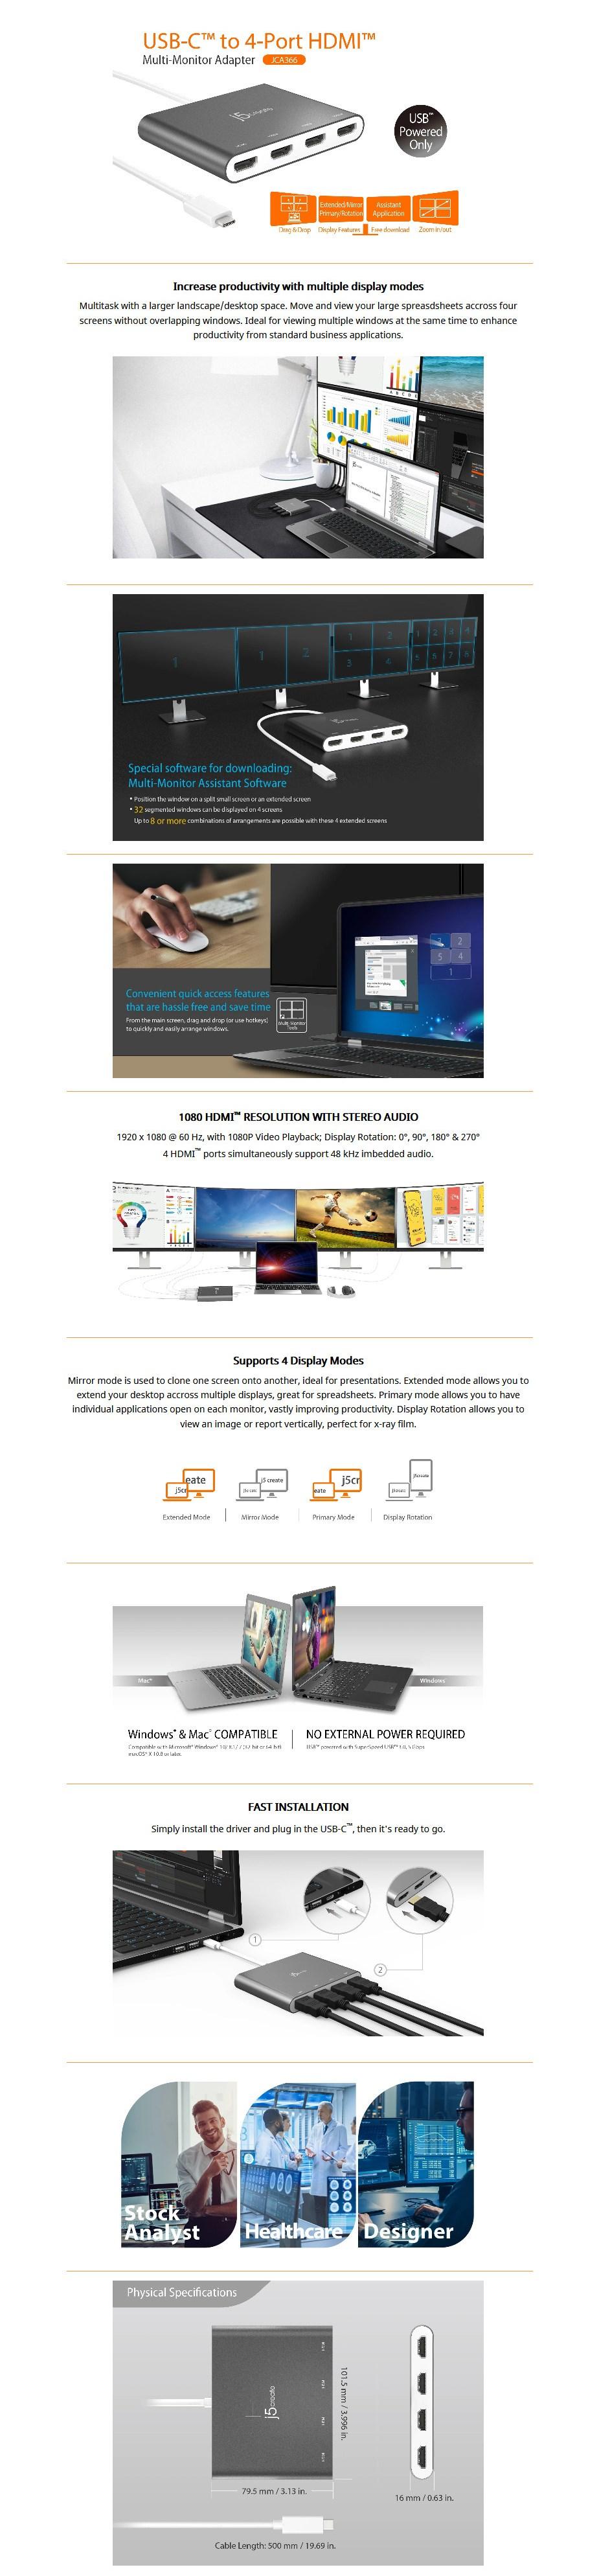 j5create JCA366 4-Port Multi-Monitor USB-C to HDMI Adapter - Overview 1